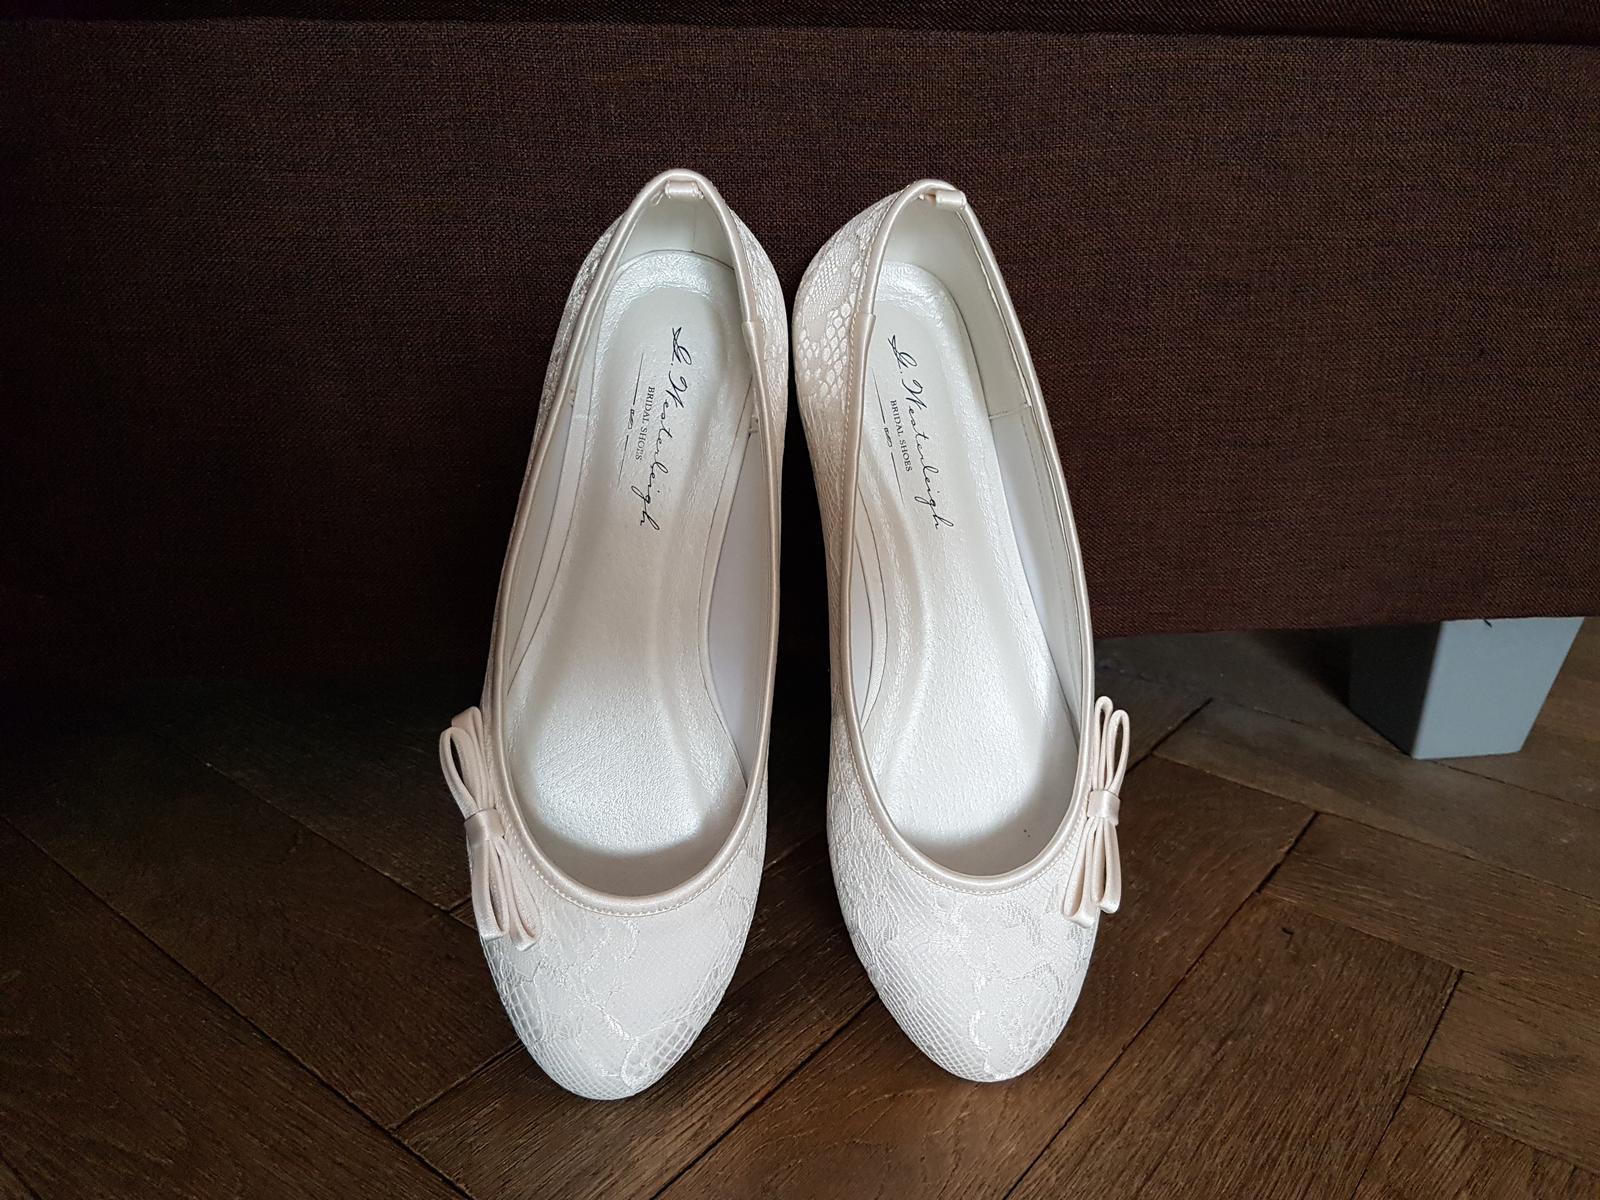 Svadobné balerínky - ivory - Obrázok č. 1